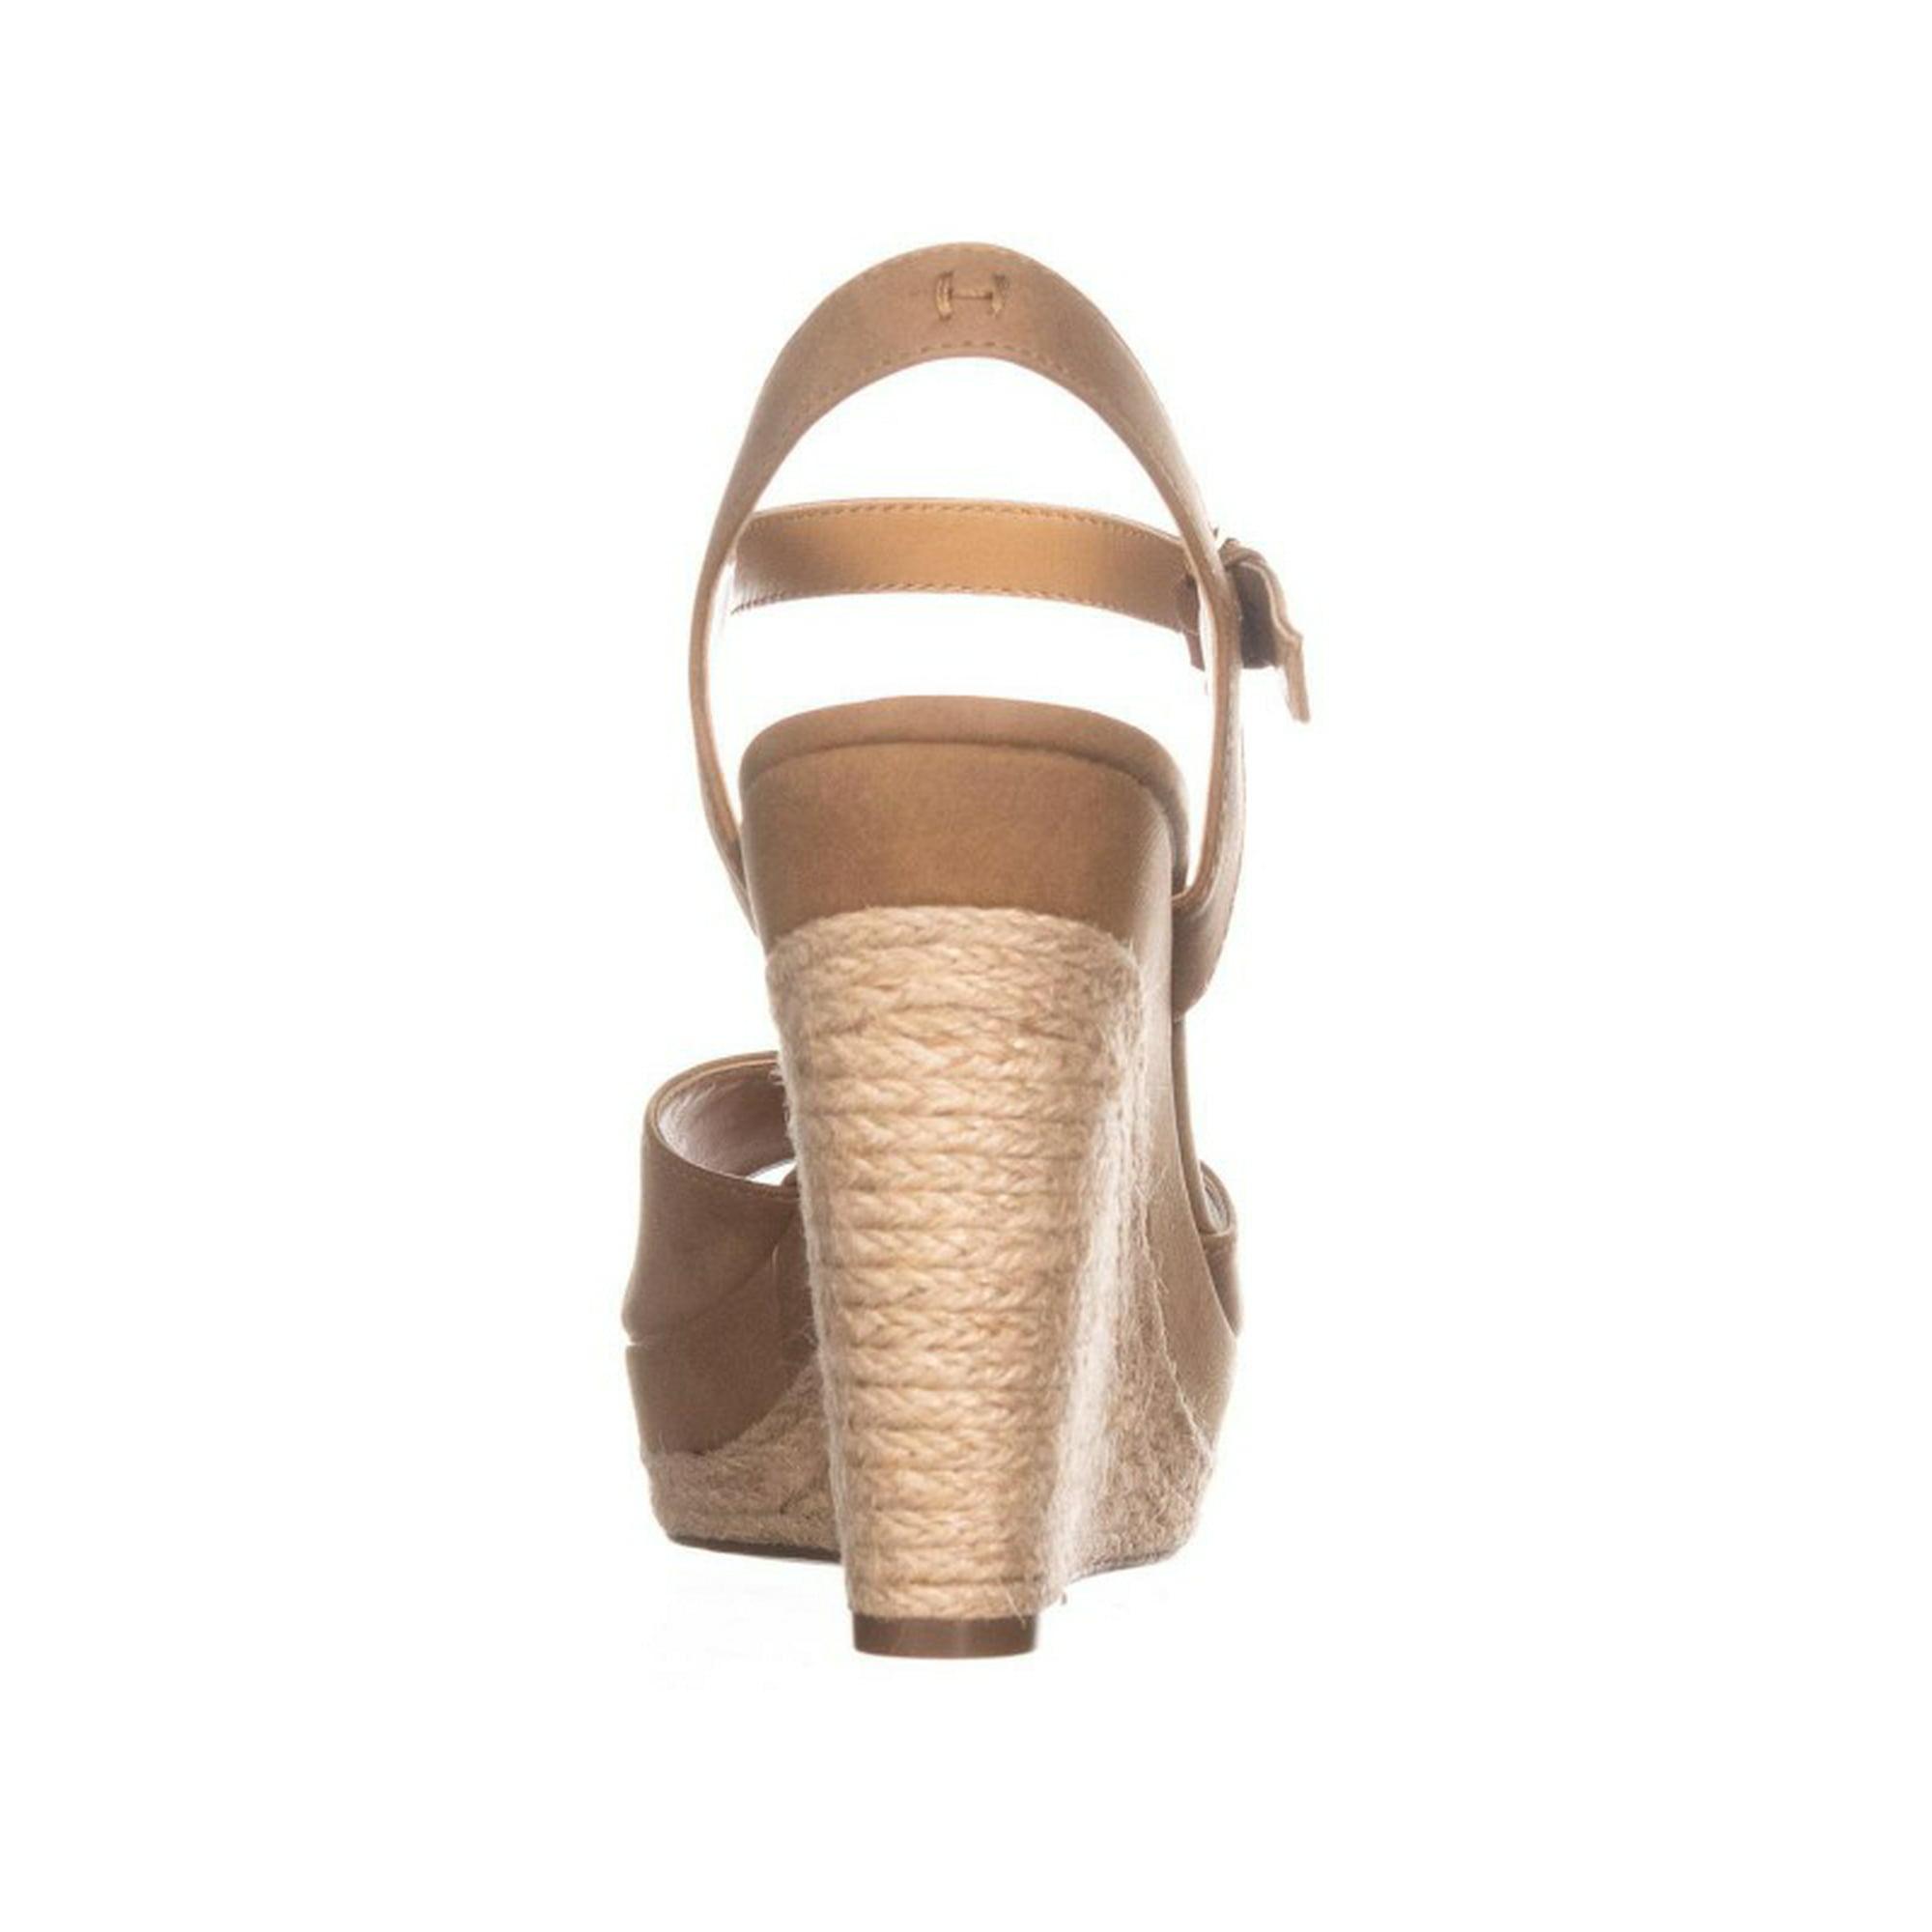 e05caaab Womens Tommy Hilfiger Kali Peep Toe Wedge Sandals, Medium Brown | Walmart  Canada